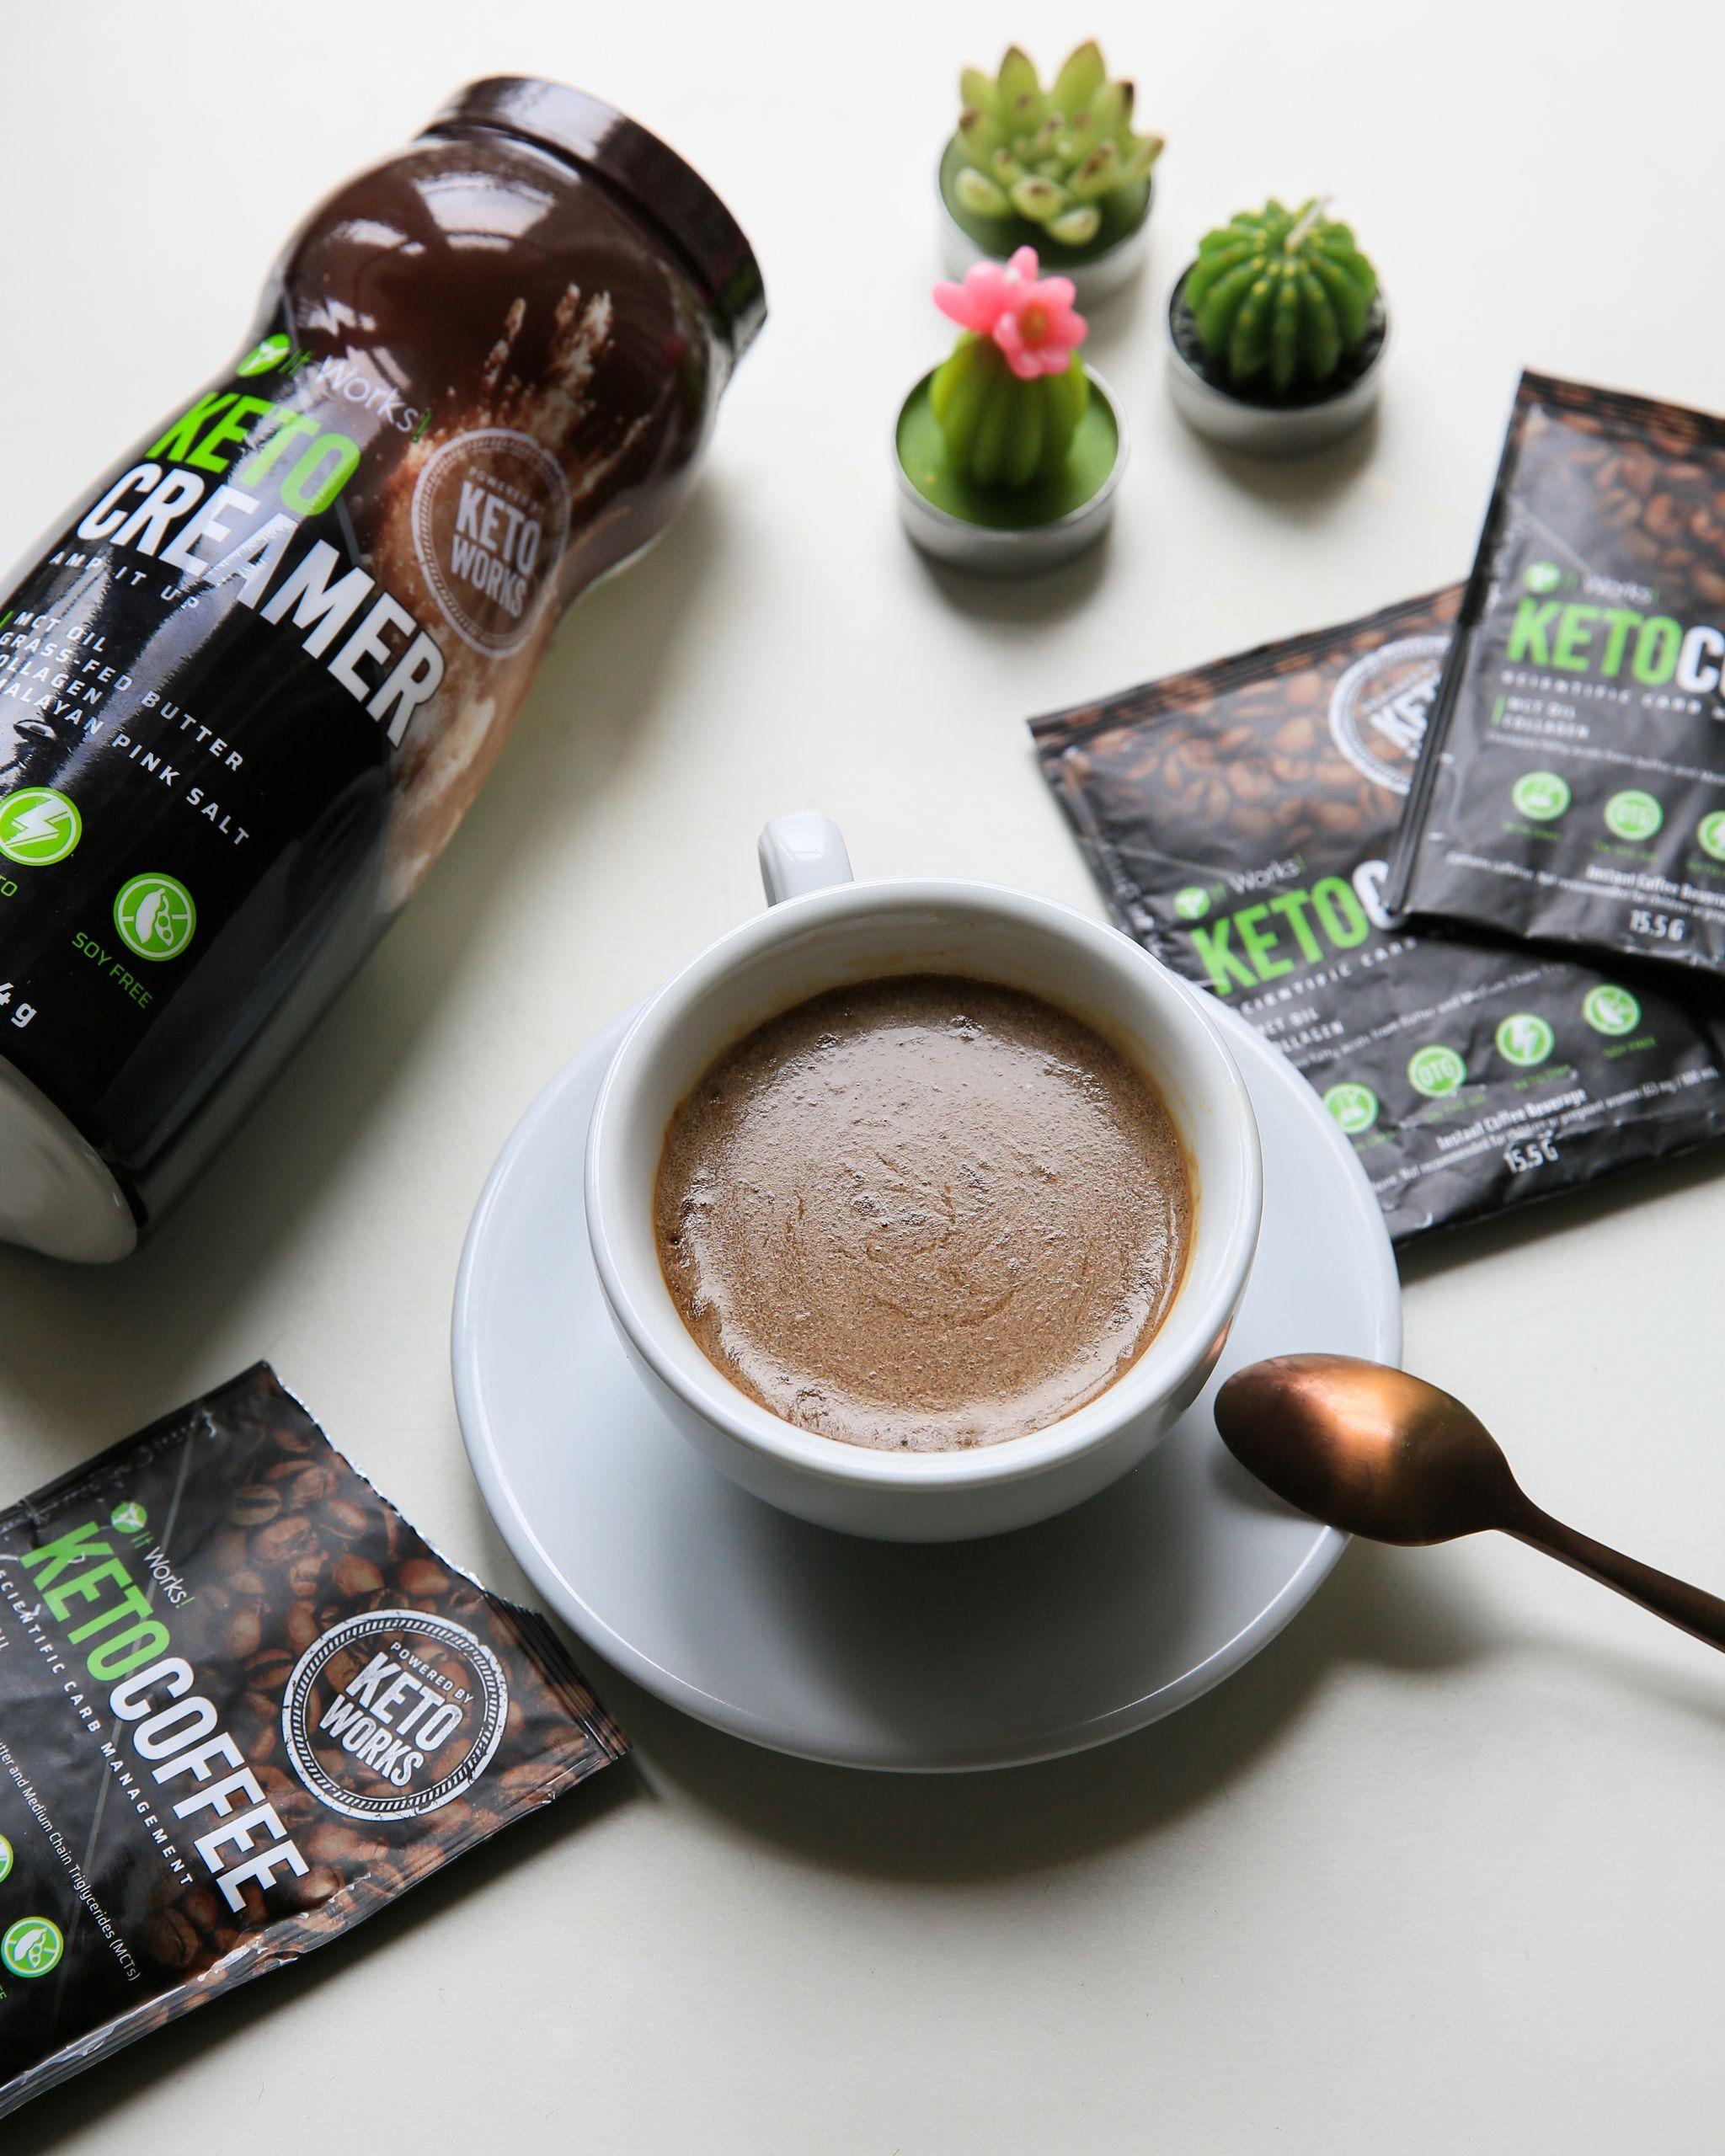 Keto Creamer and Keto Coffee. The perfect allies to keep